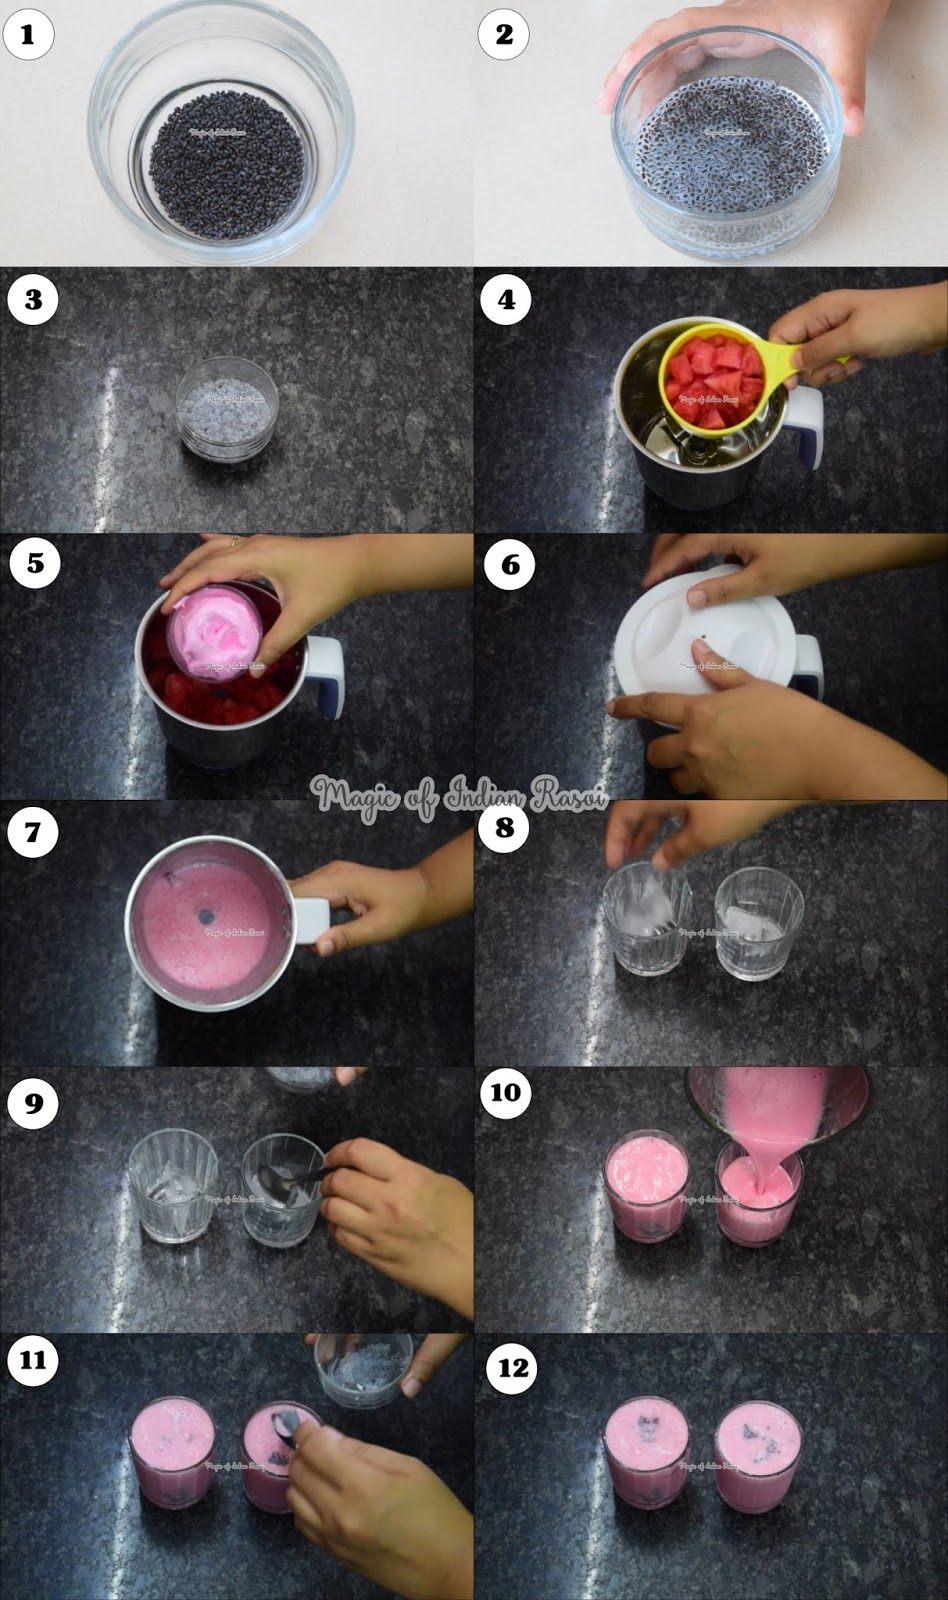 Watermelon & Strawberry Delight Drink Recipe - तरबूज और स्ट्रॉबेरी डिलाईट रेसिपी - Priya R - Magic of Indian Rasoi